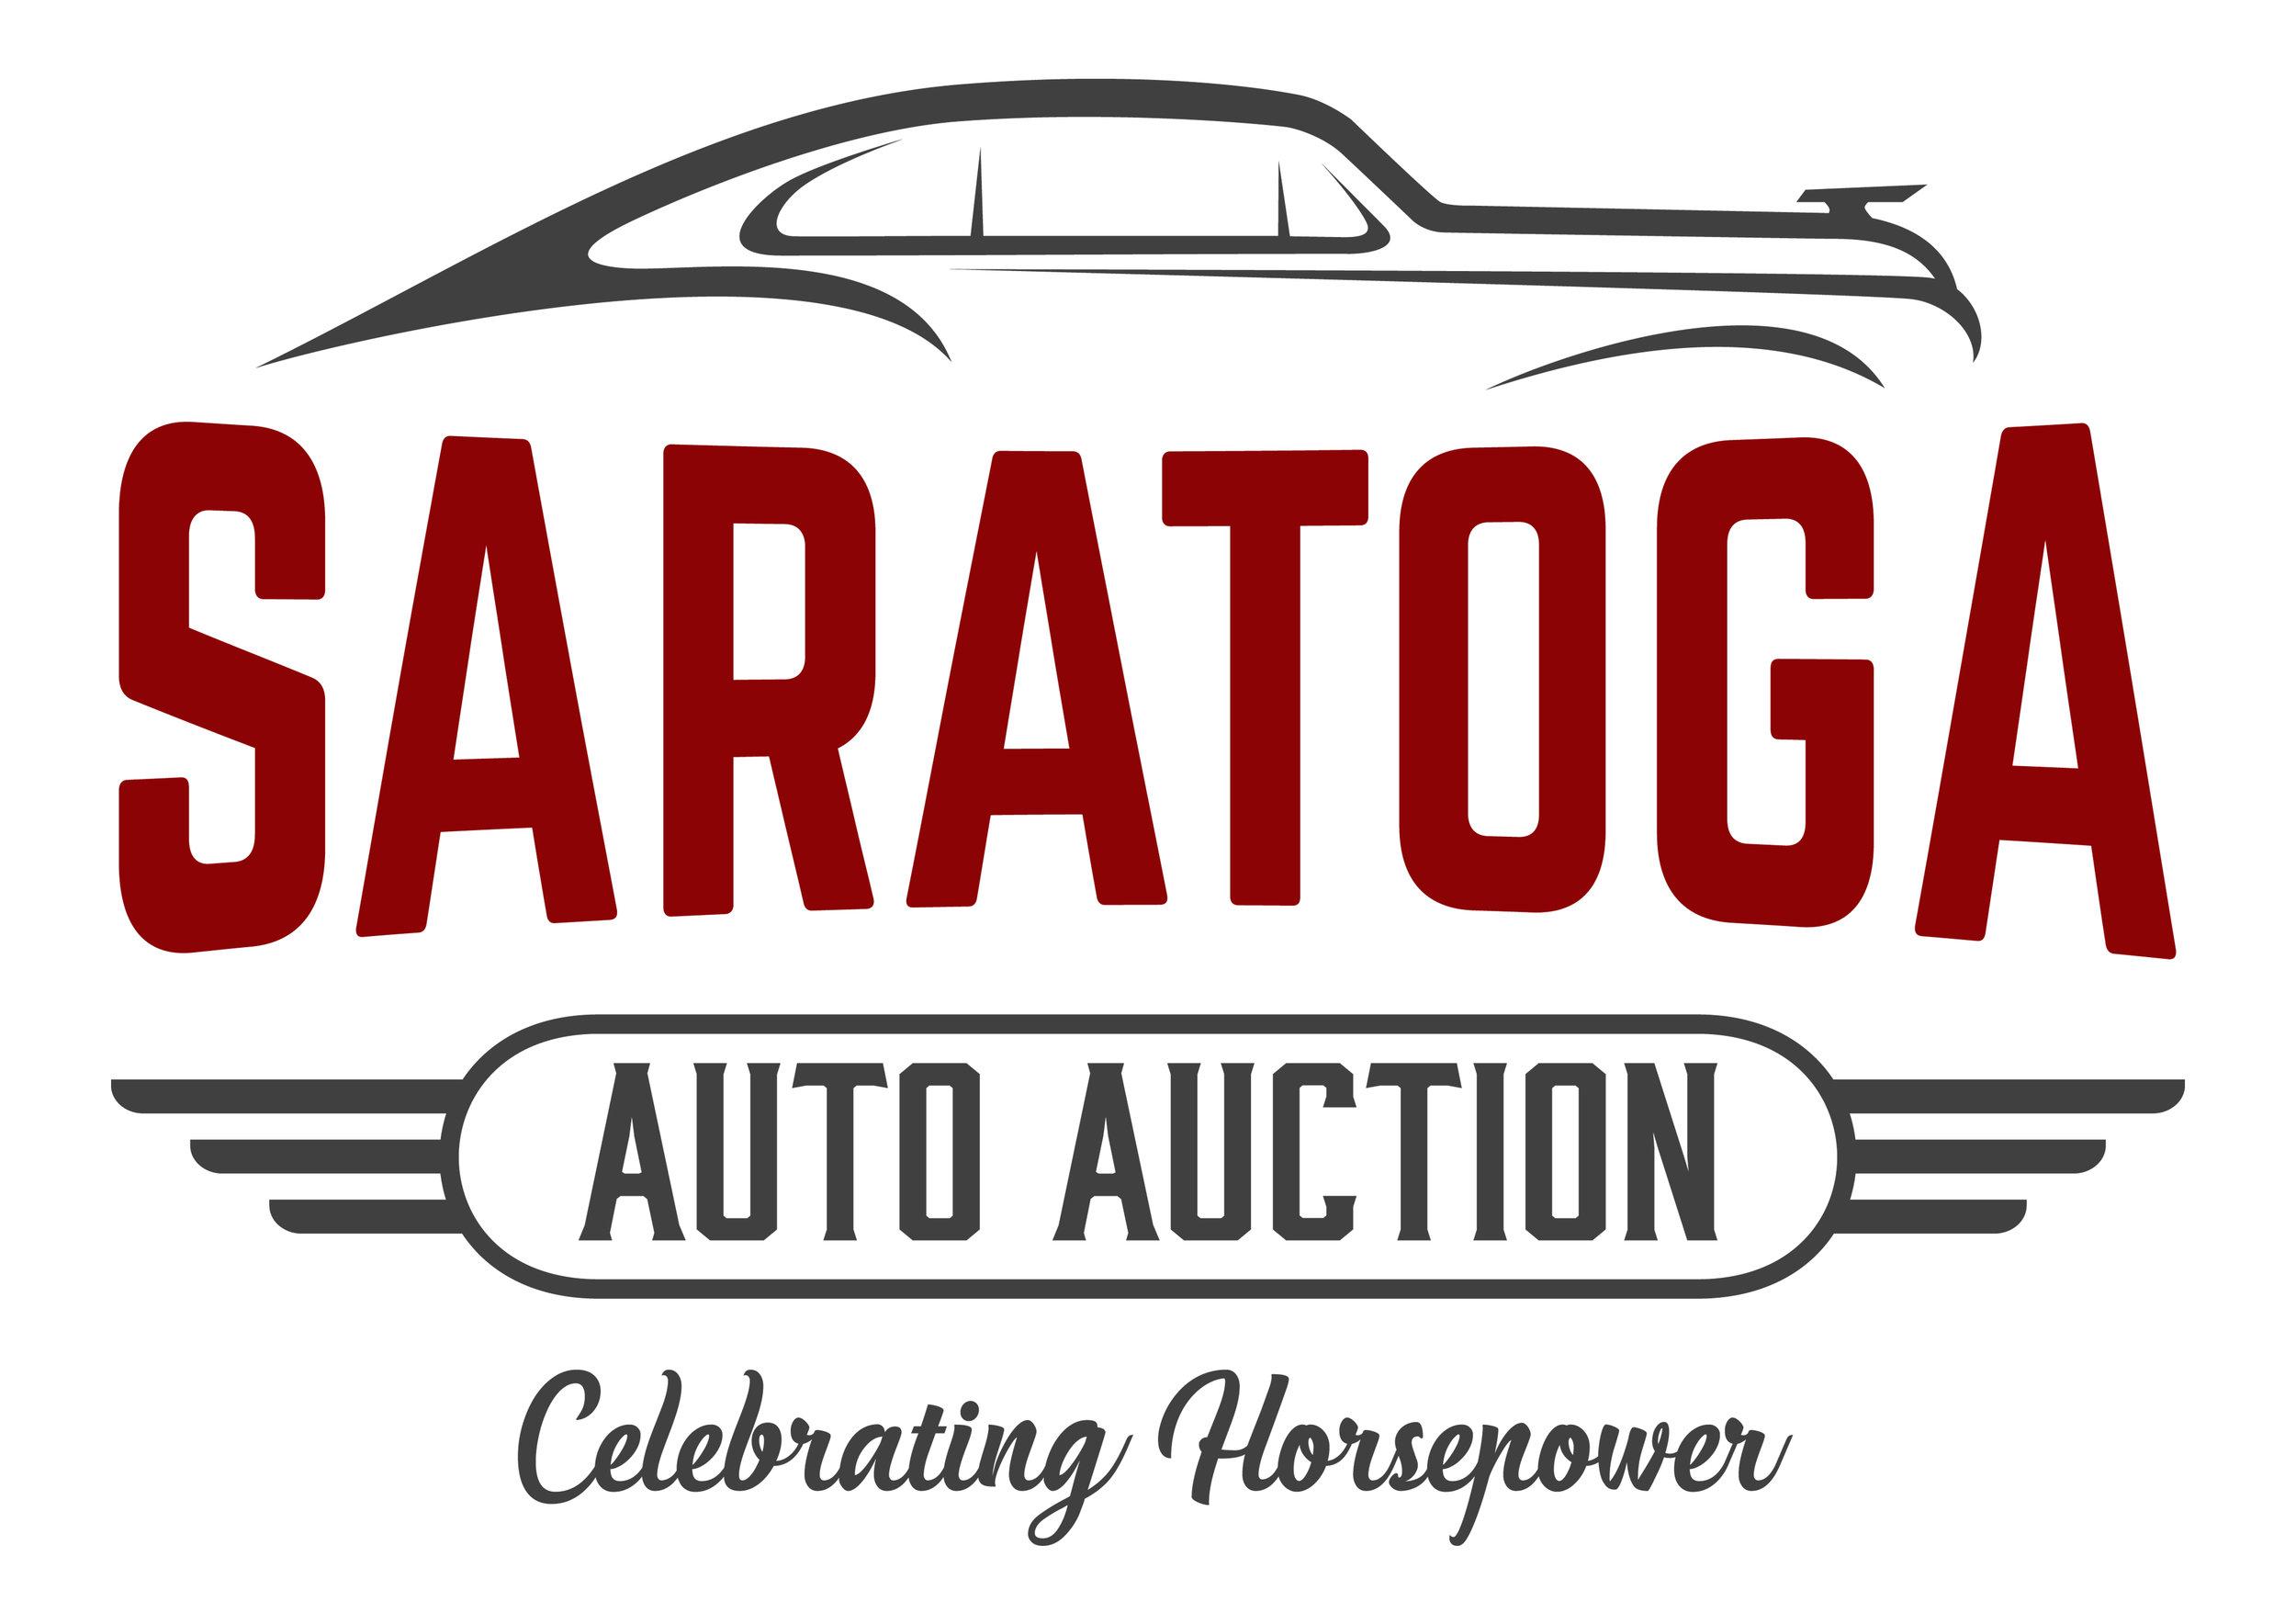 55ca578d51 Saratoga Auto auction logo - revised.jpg